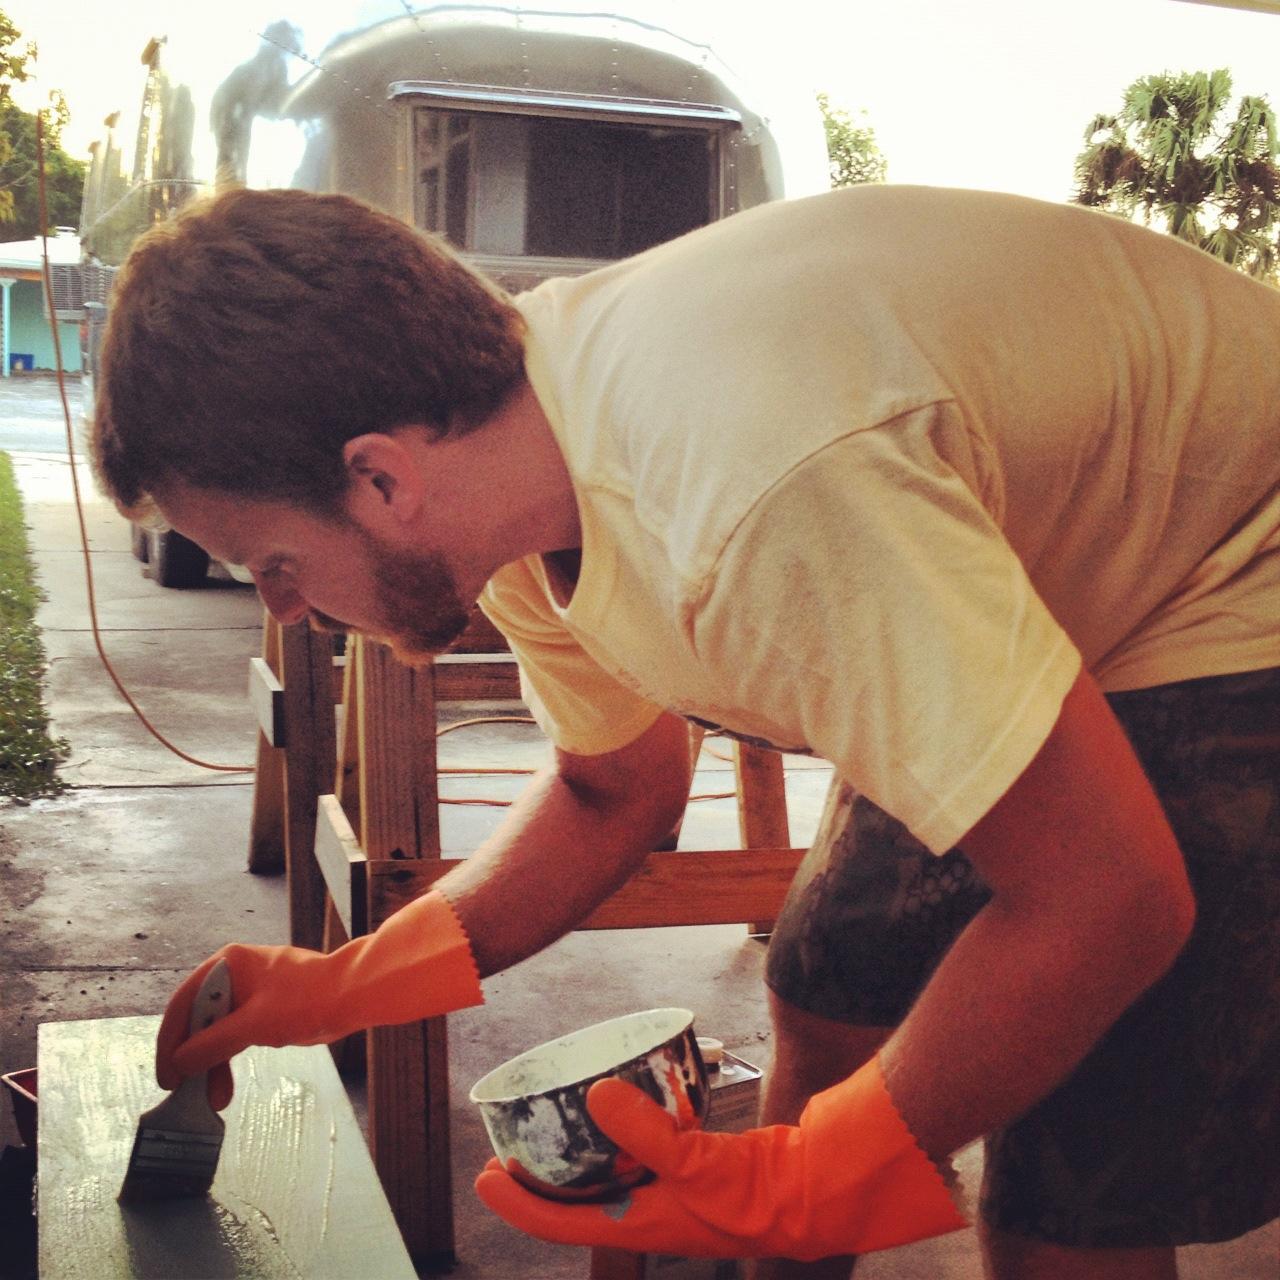 Justin applies the paint stripper